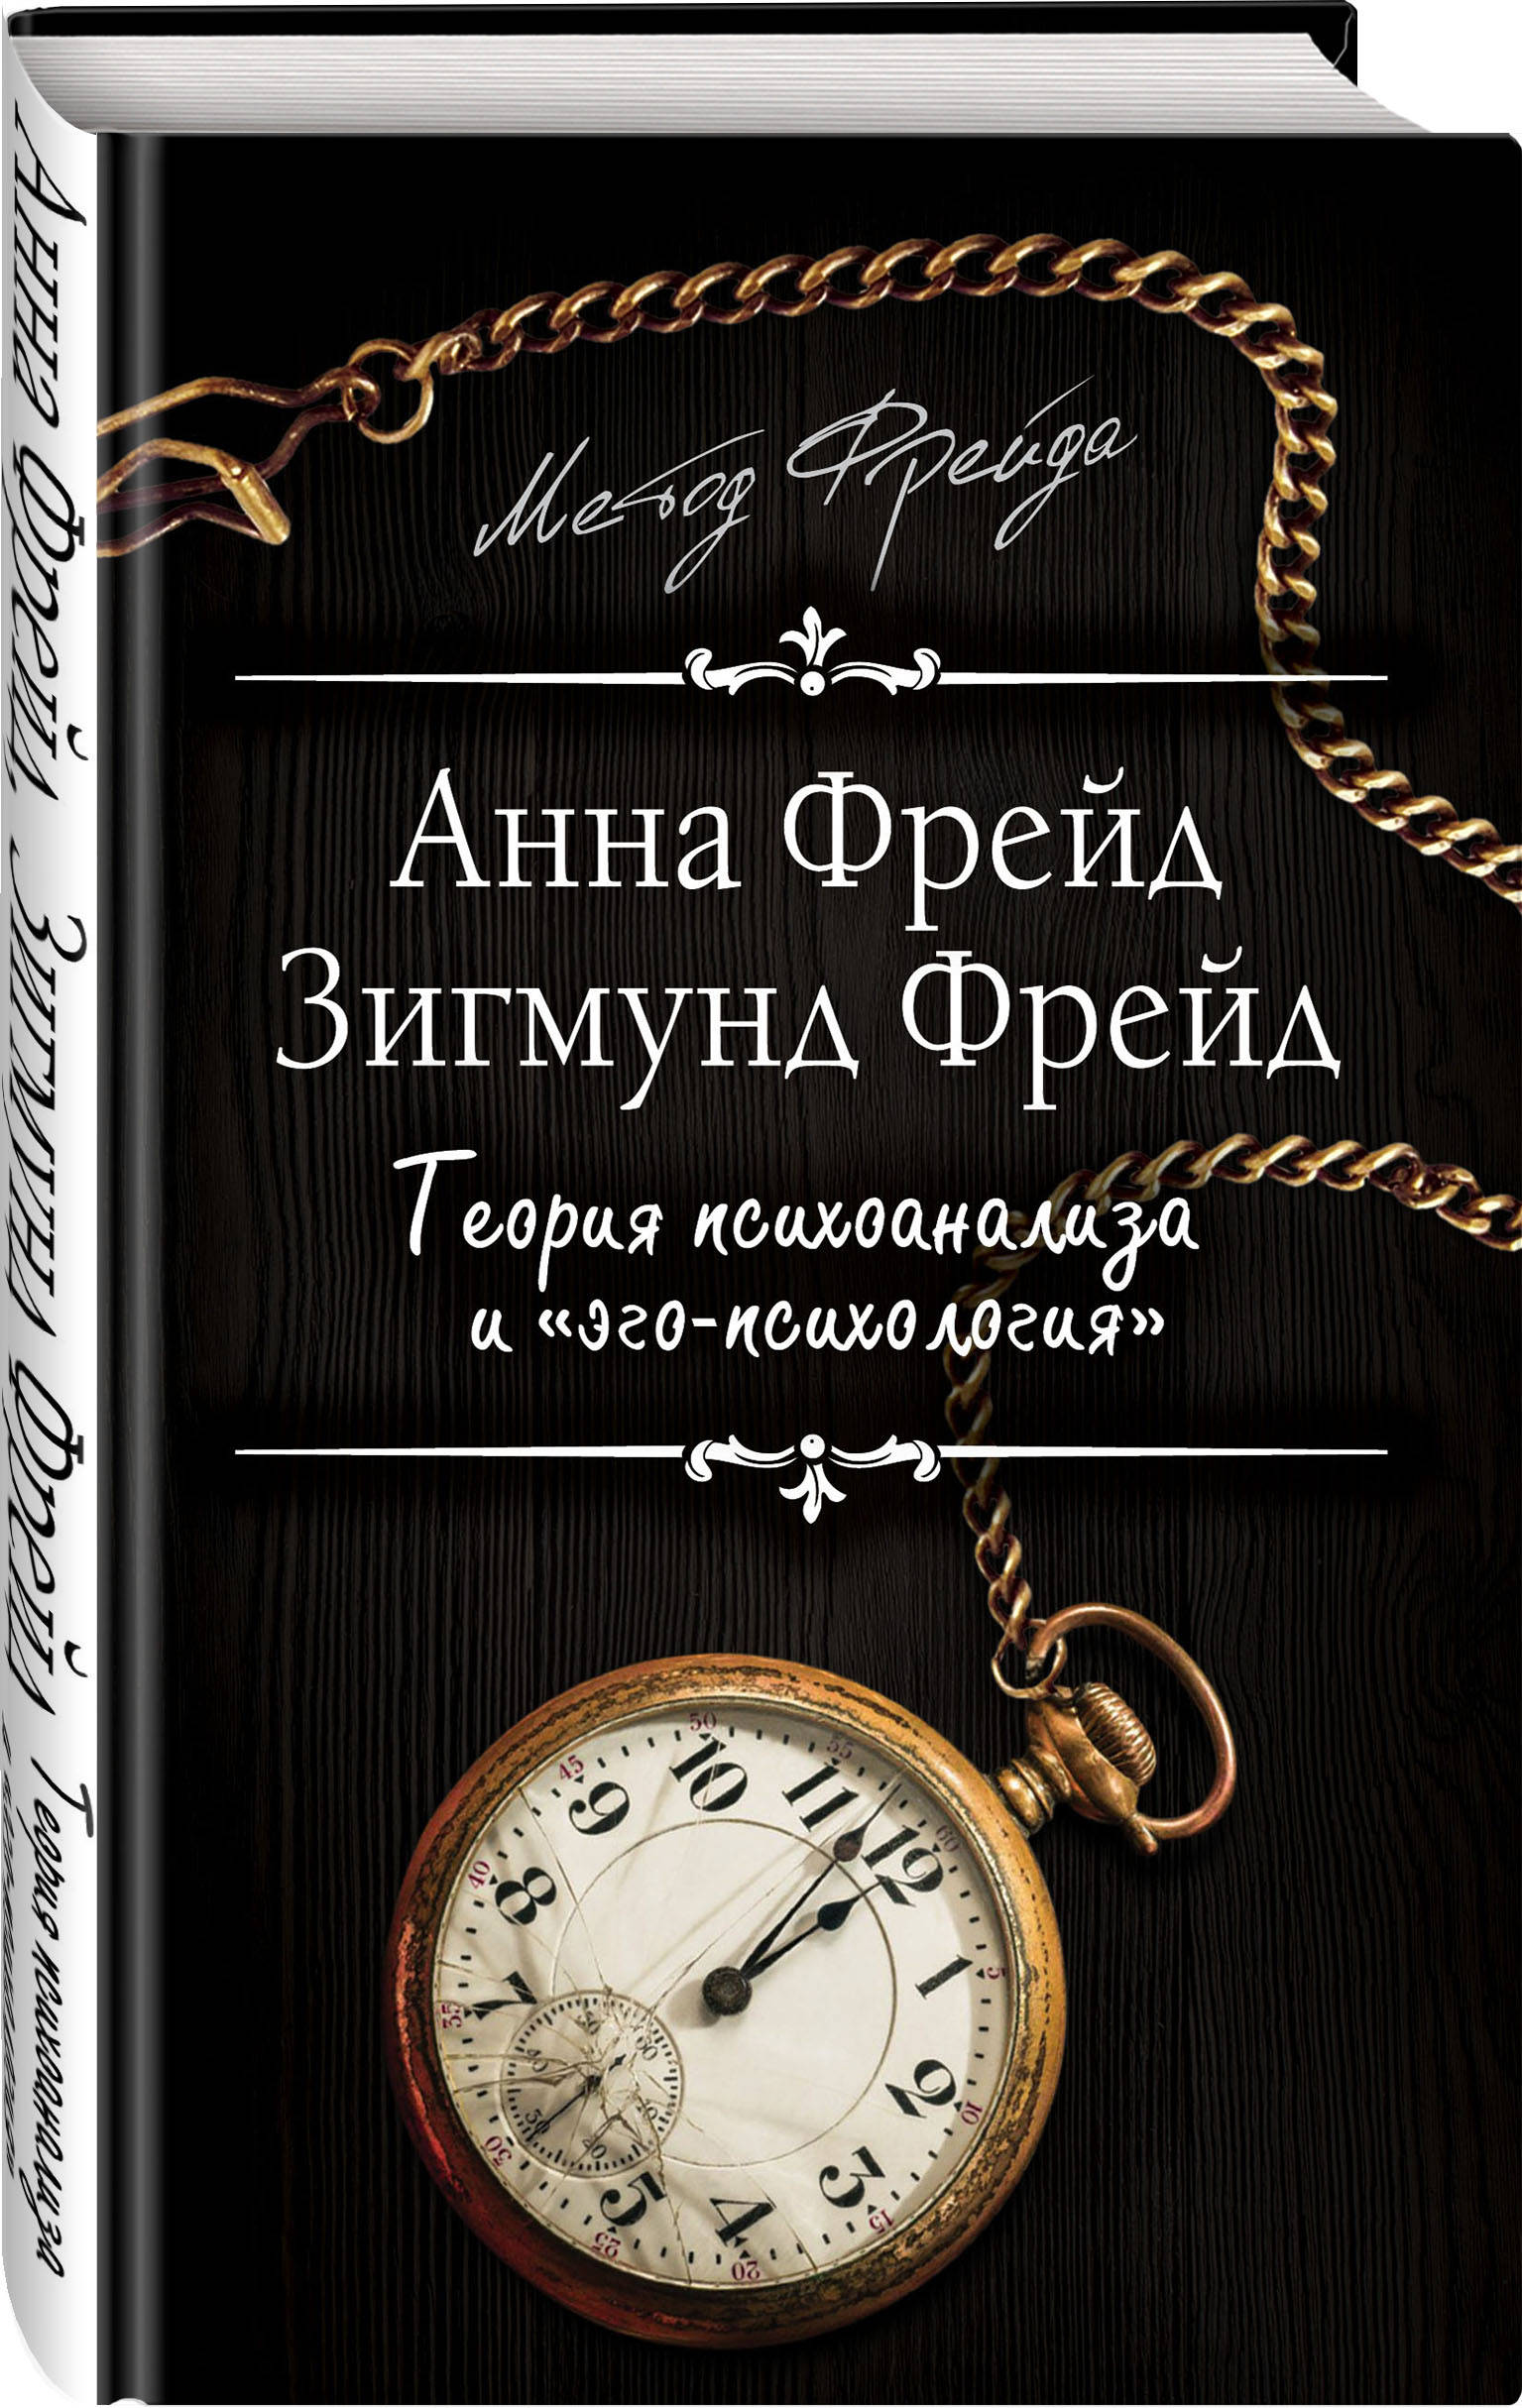 цена на Анна Фрейд, Зигмунд Фрейд Теория психоанализа и эго-психология